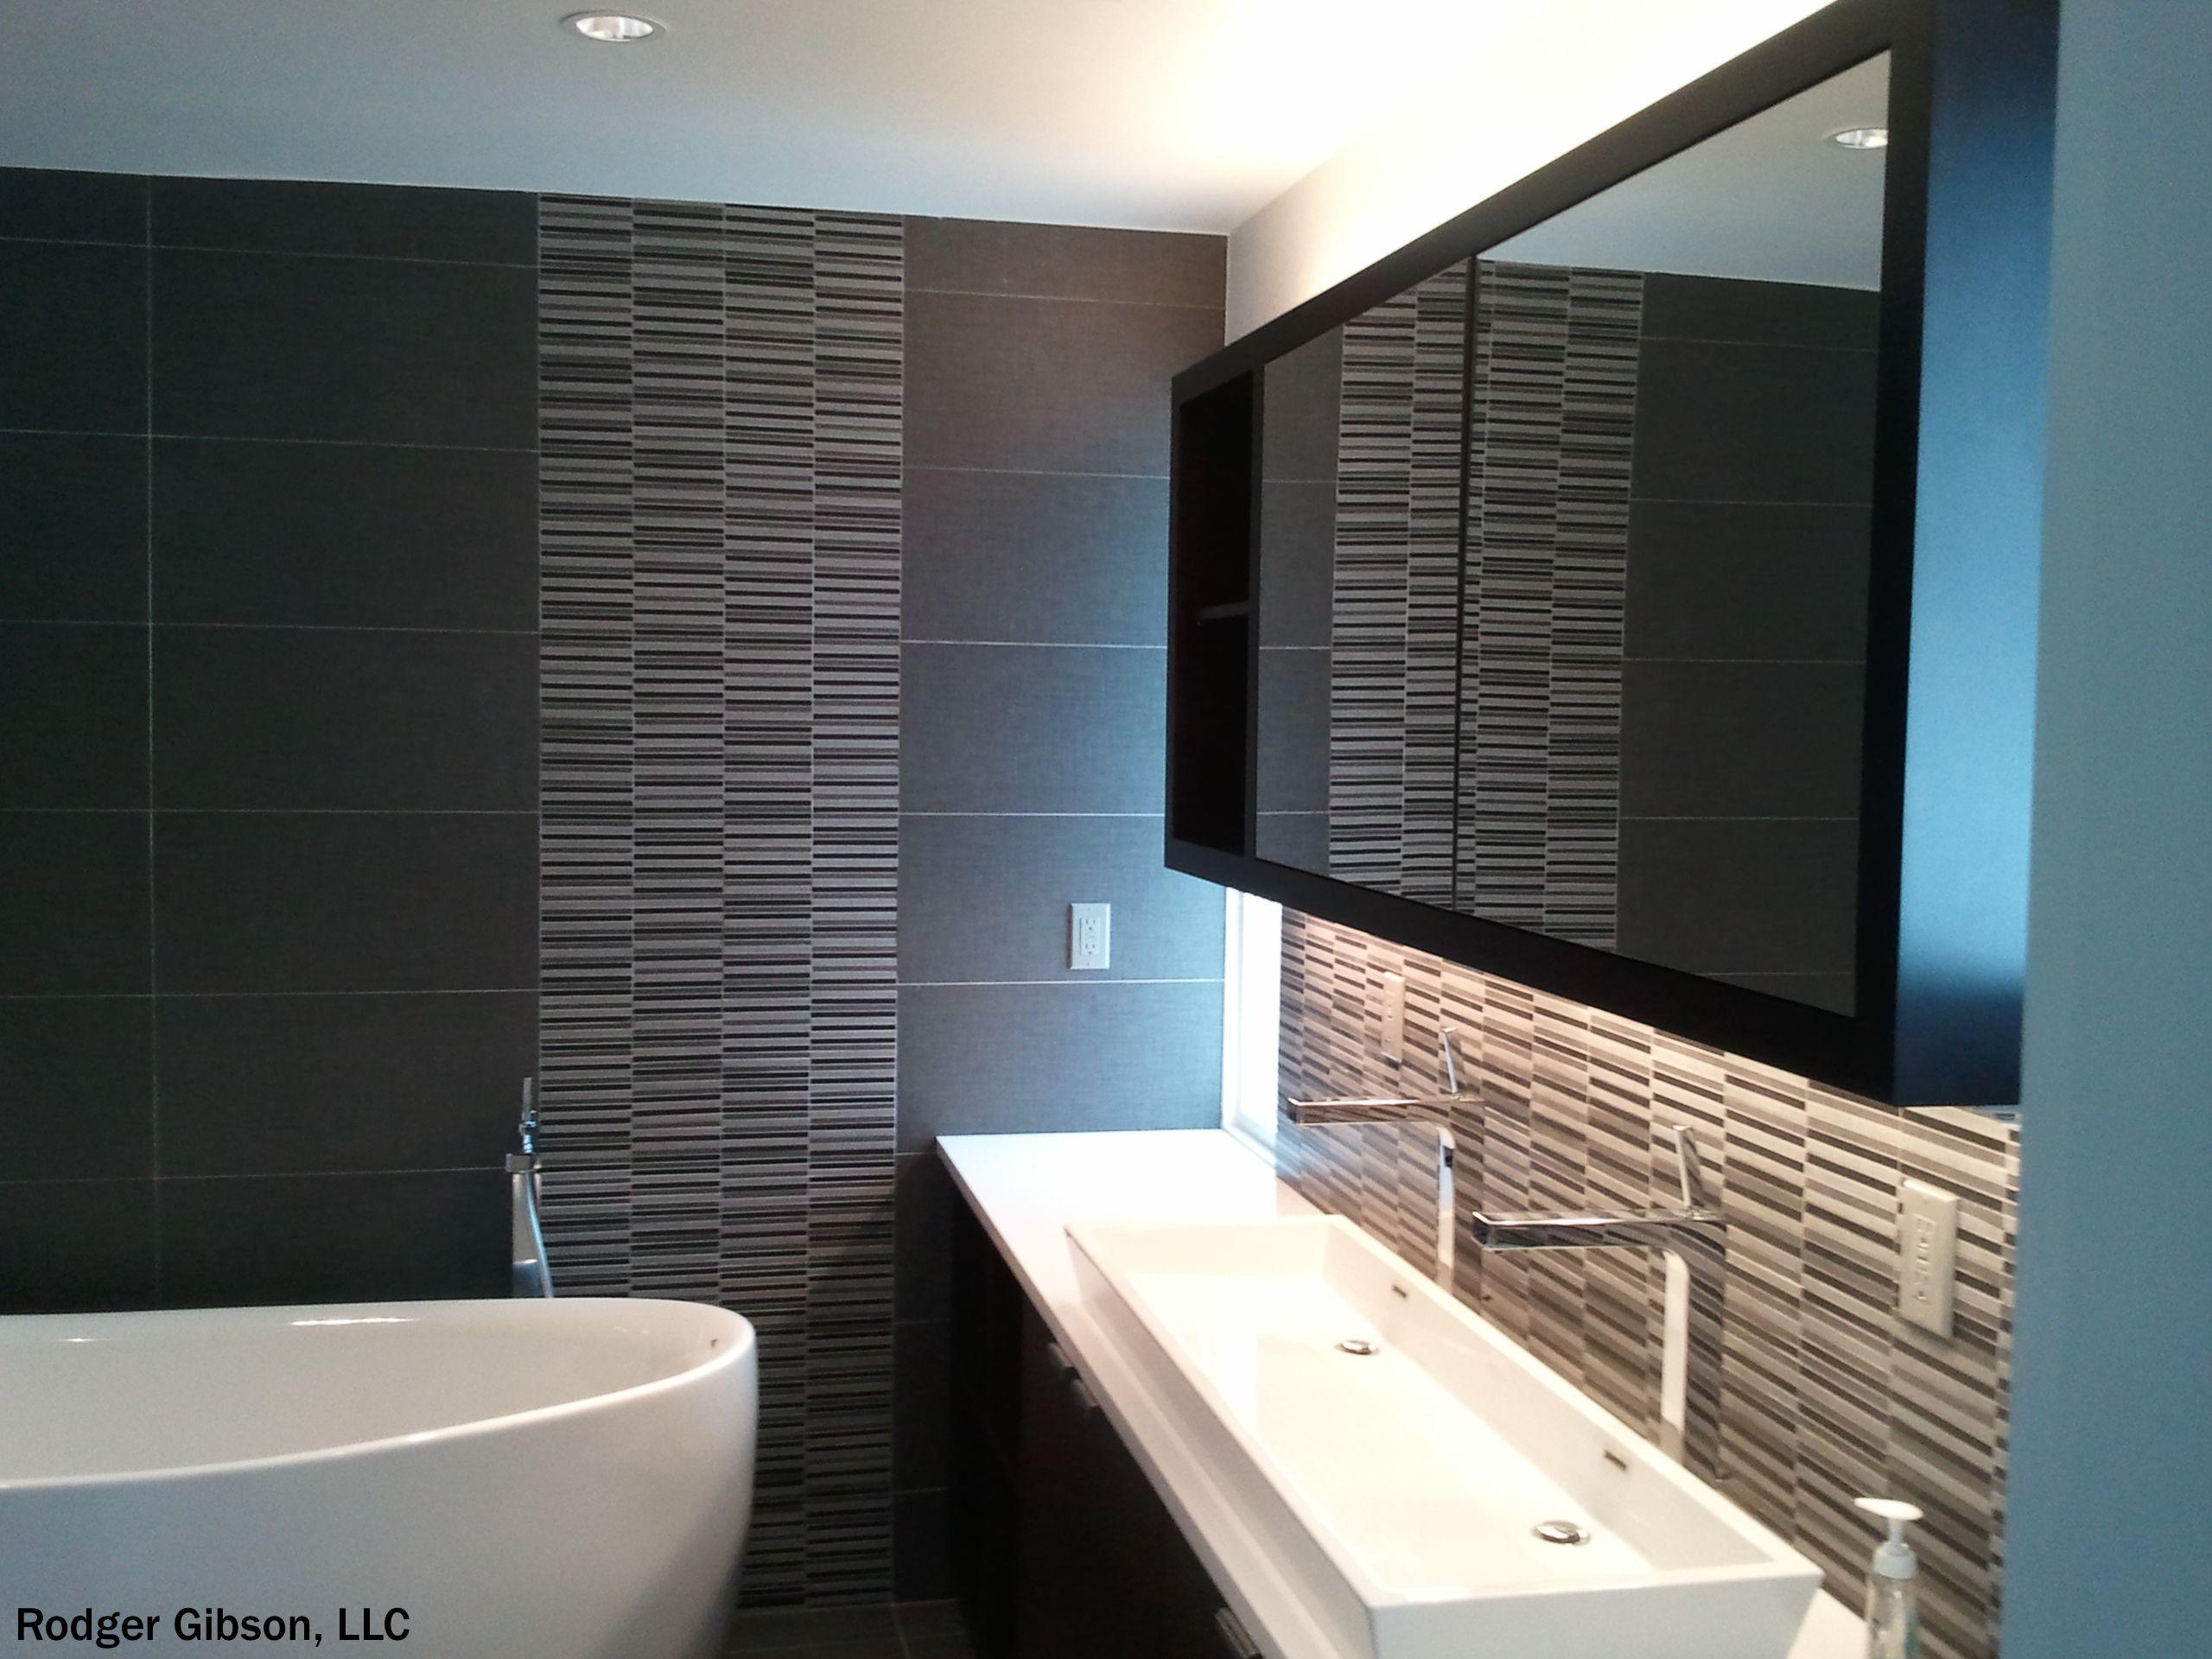 2020 Bathroom Remodel Cost Average Cost Of Bathroom Remodel Renovations Cheap Bathroom Remodel Inexpensive Bathroom Remodel Small Bathroom Remodel